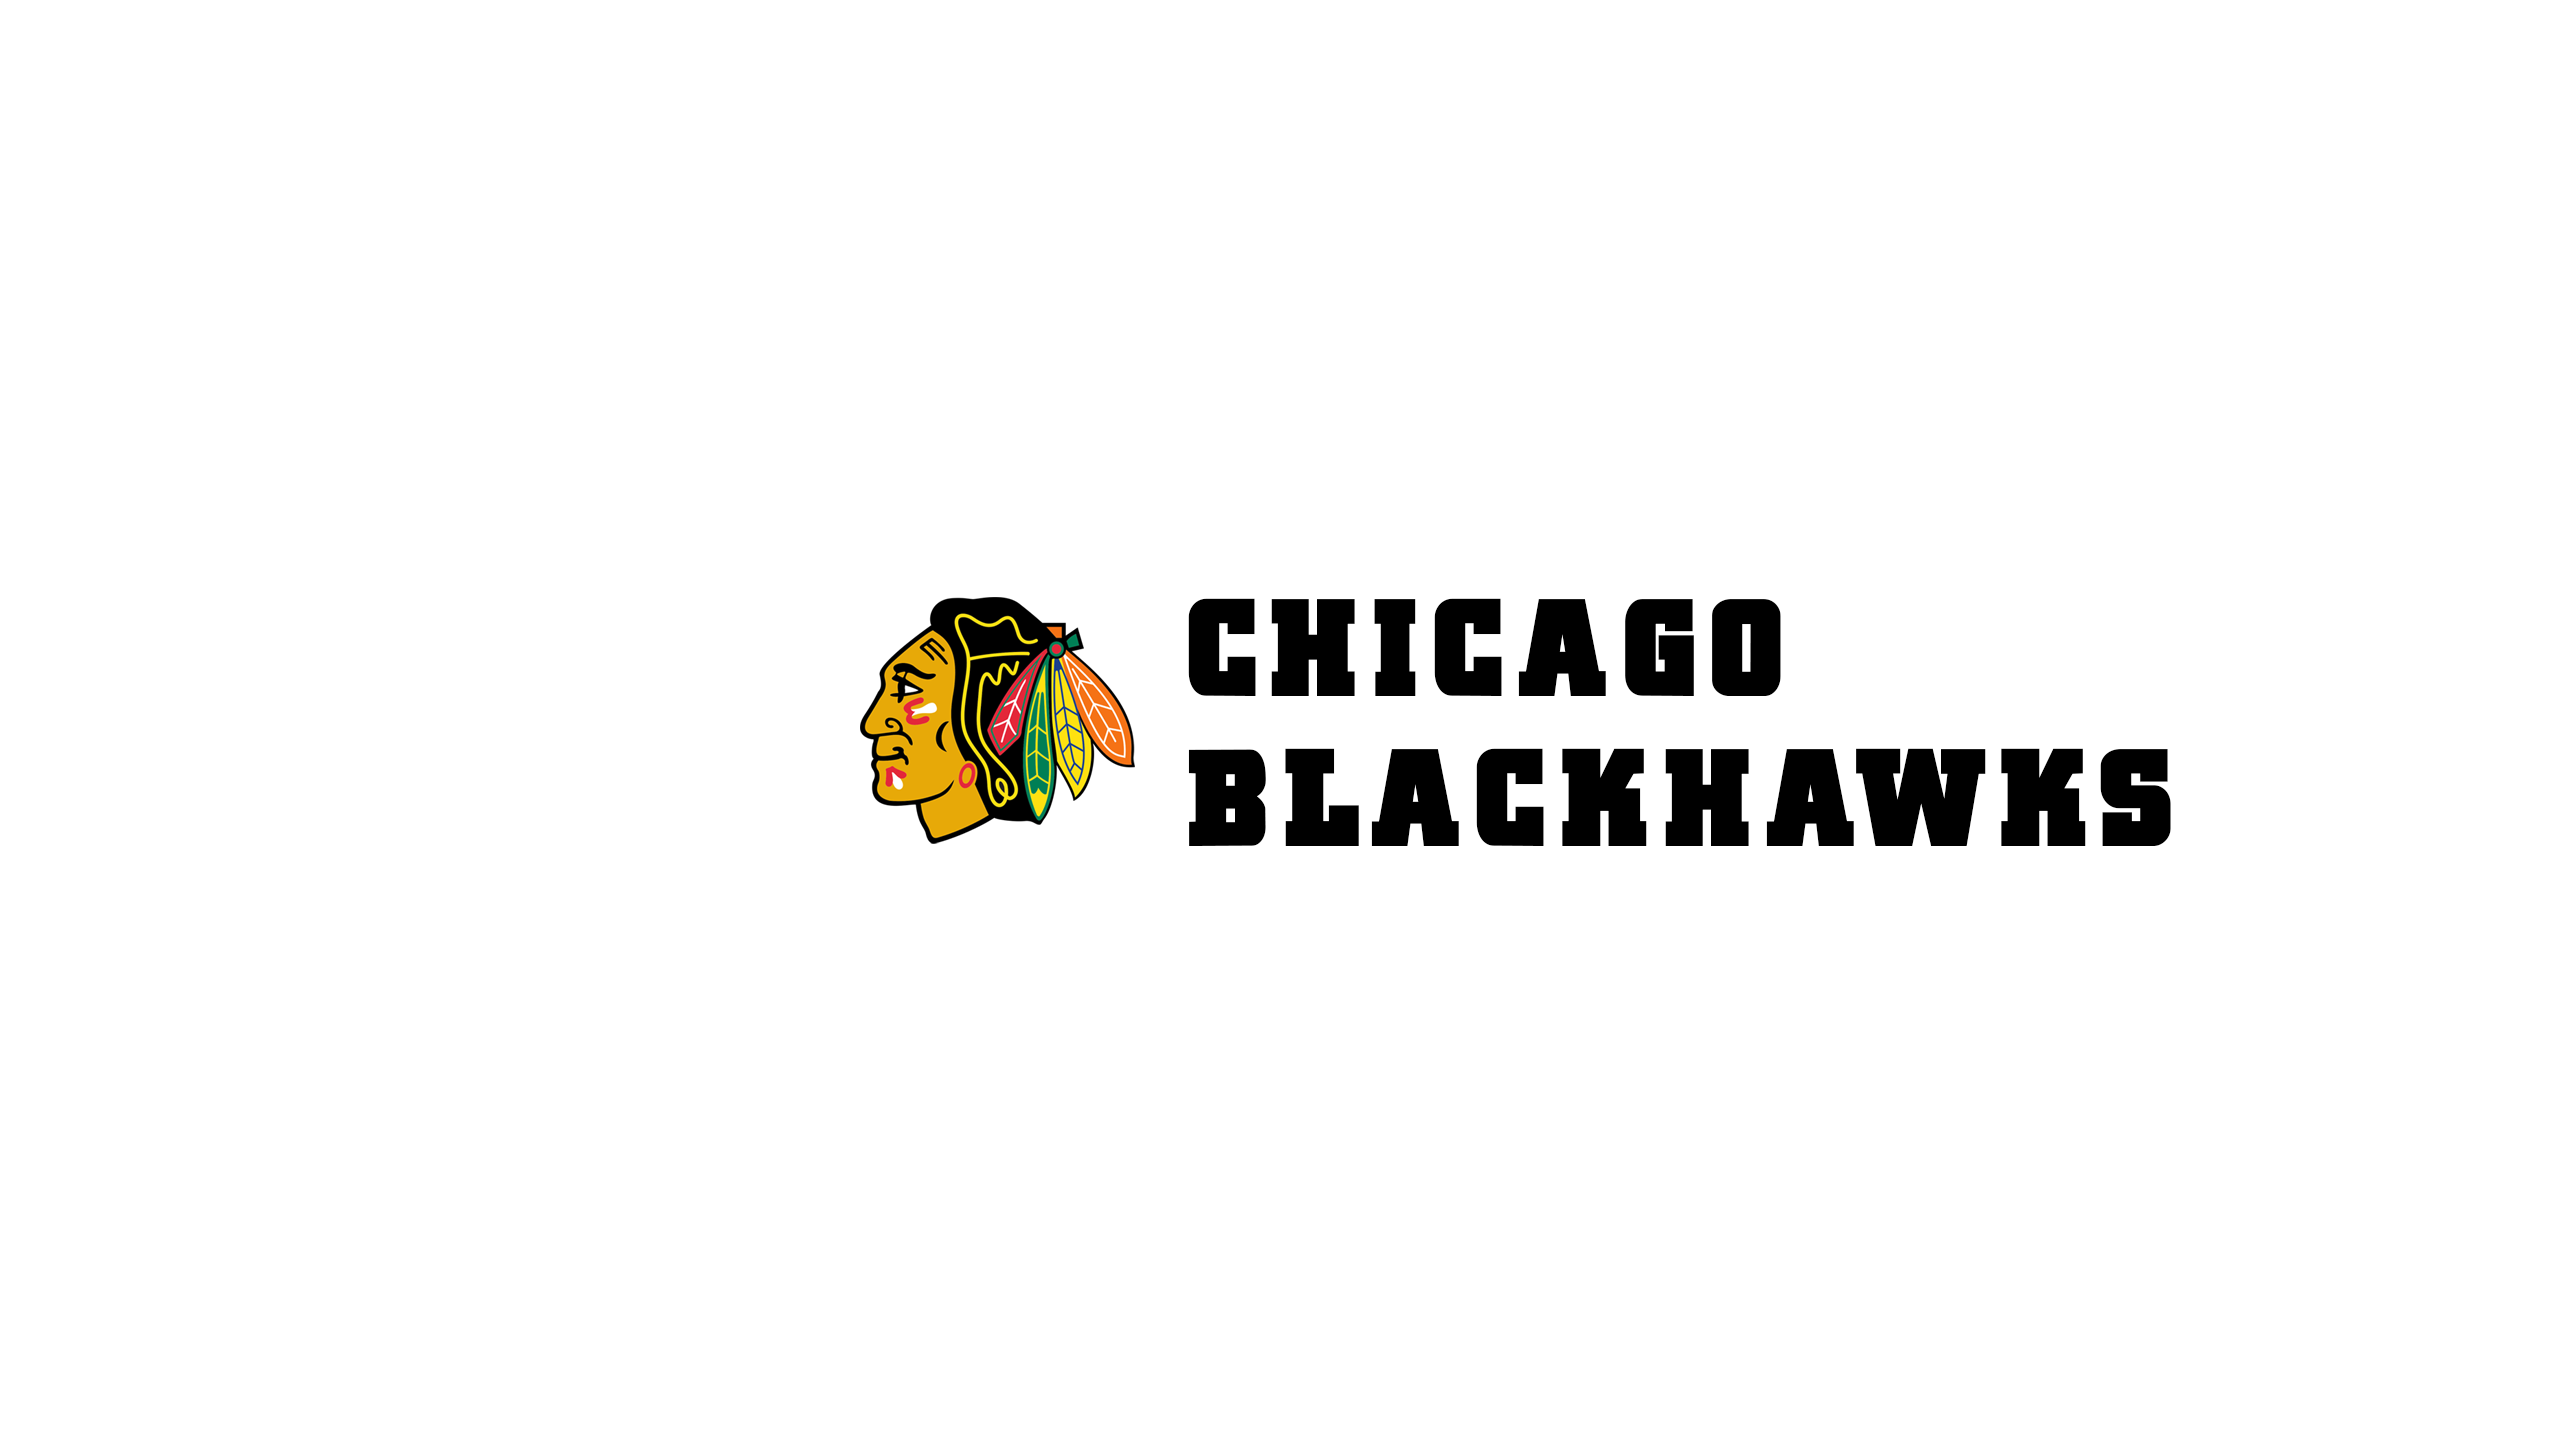 Chicago Blackhawks (Wordmark)